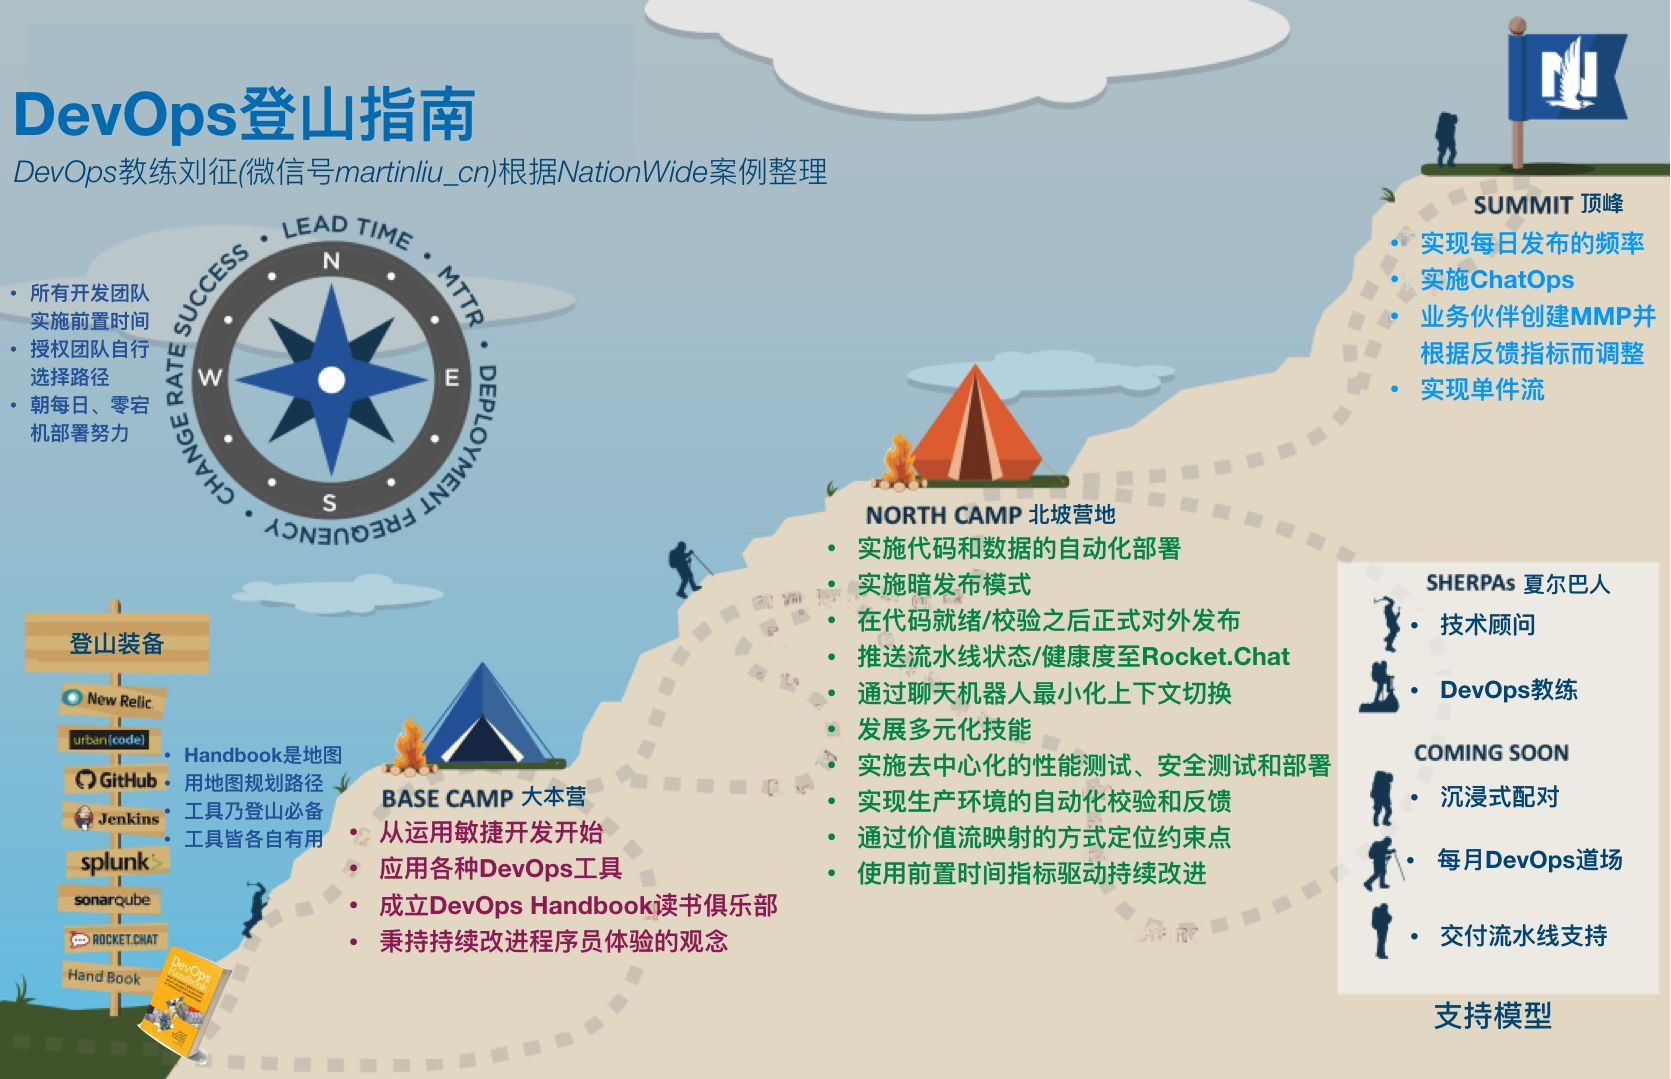 DevOps登山指南手册